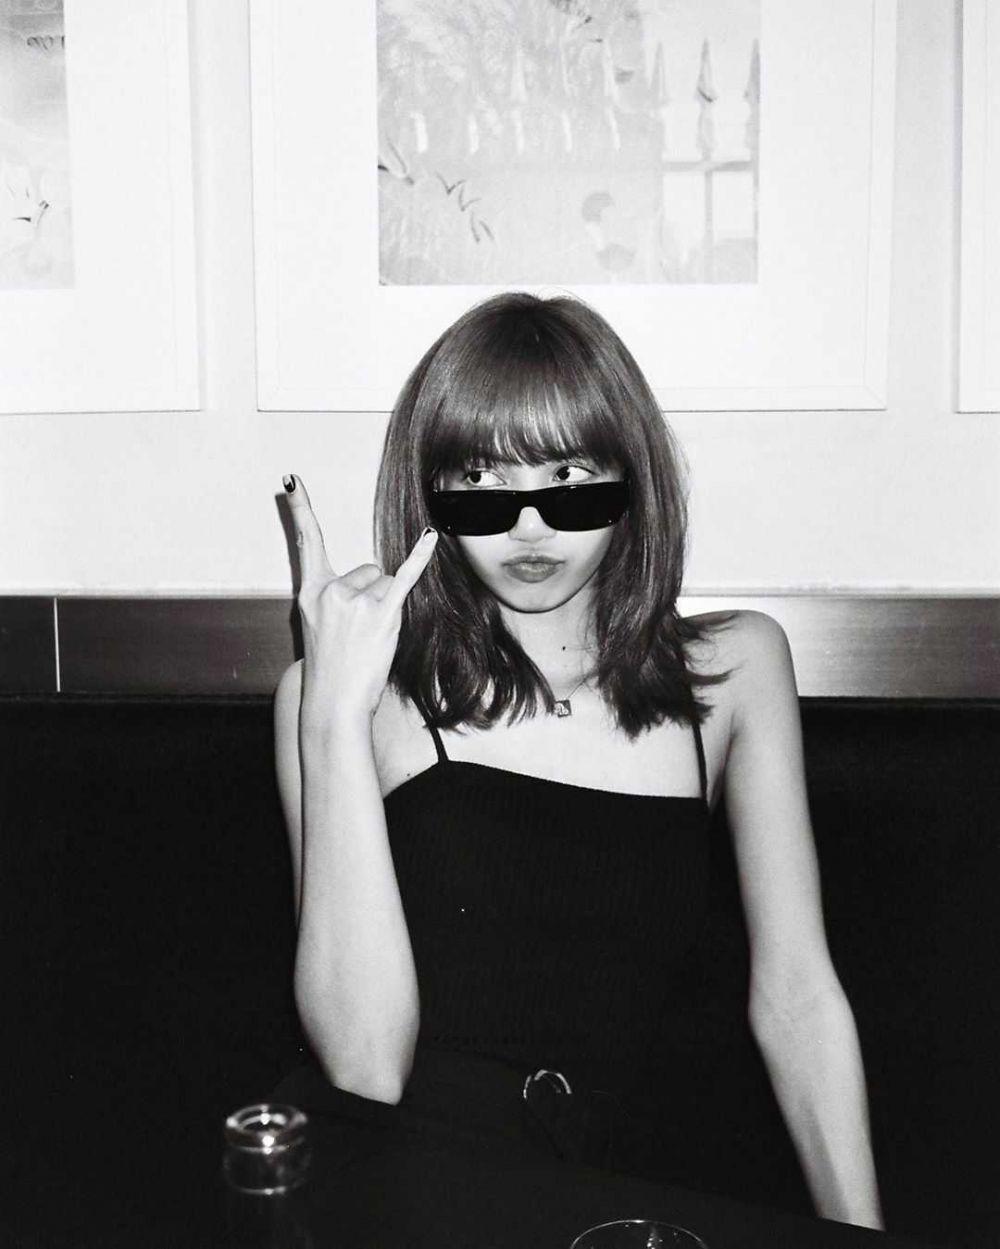 12 Potret Black and White ala Lisa BLACKPINK, Bikin Terpukau!